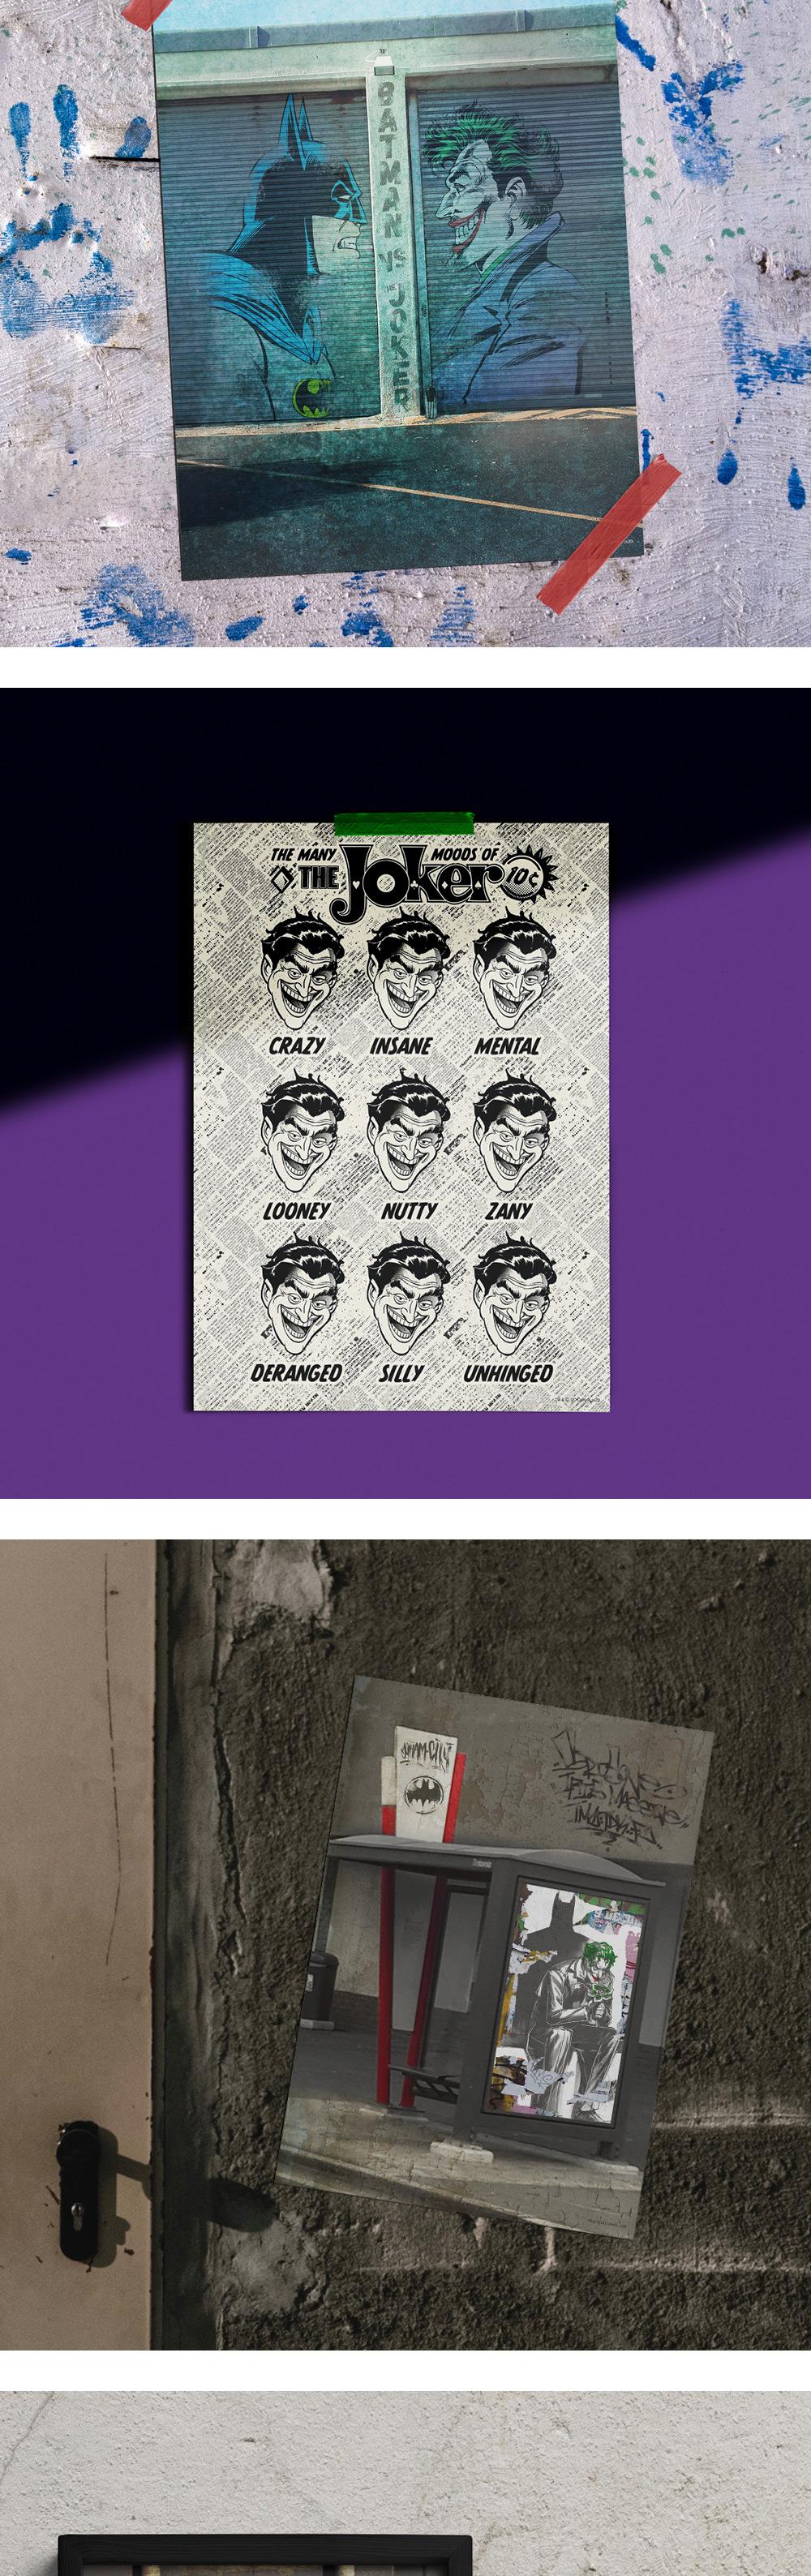 DC코믹스 인테리어 포스터_조커_03.jpg